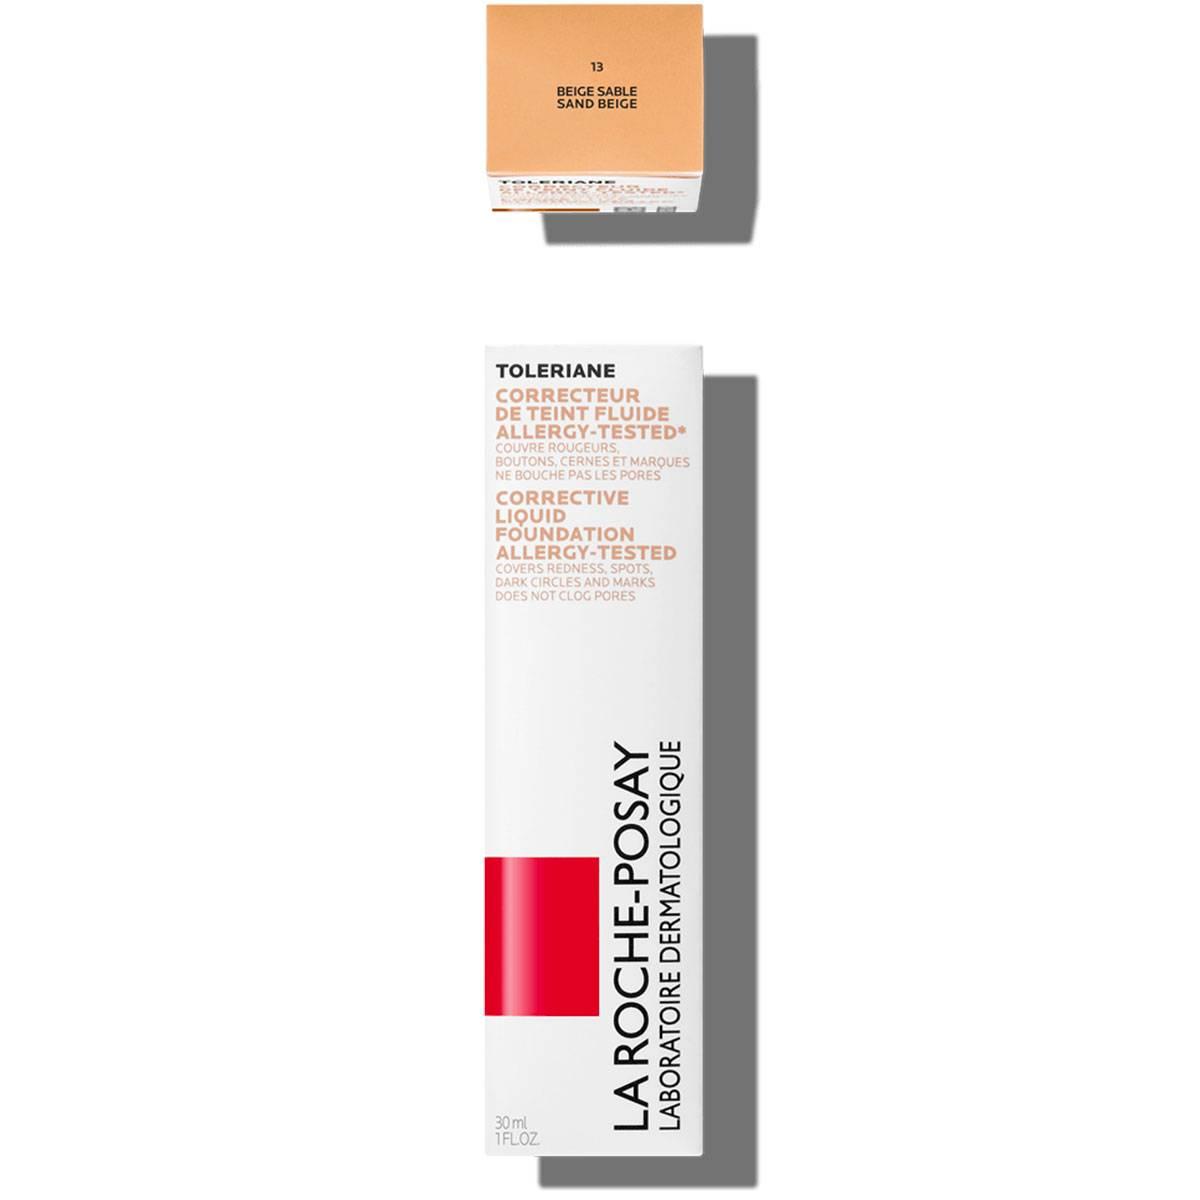 Toleriane Makeup CORRECTIVE LIQUID FOUNDATION 13 Sand Beige 2   La Roche Posay